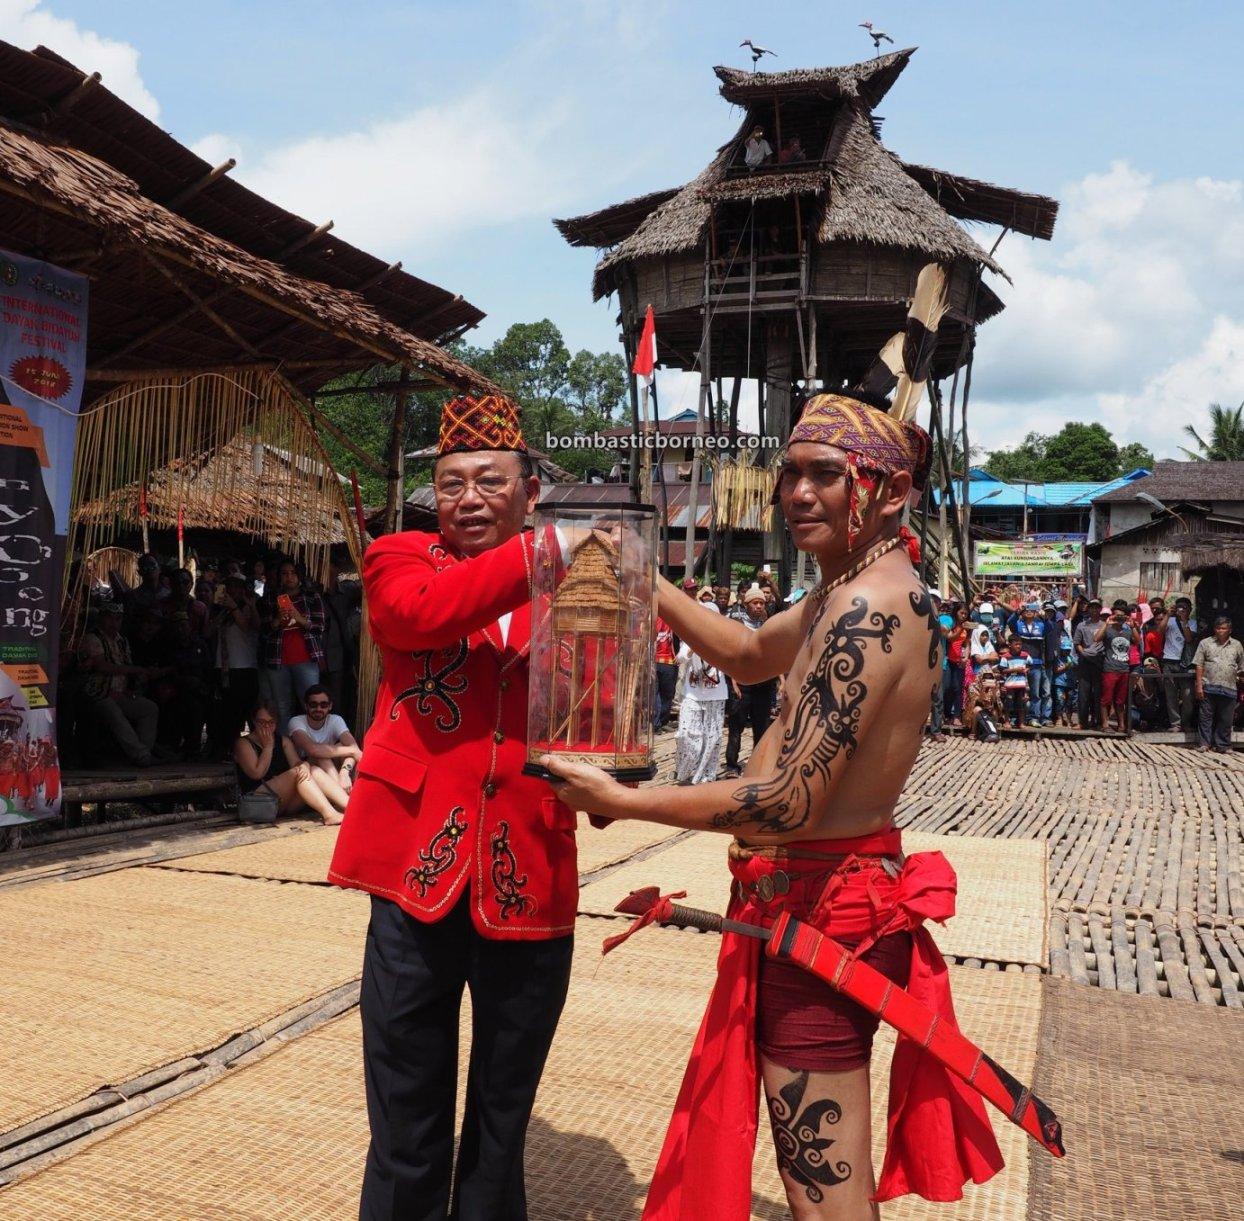 Nyobeng Sebujit, Gawai Harvest Festival, traditional, event, Bengkayang, Indonesia, tribe, native, Rumah Adat Baruk, tourism, travel guide, Trans Border, Borneo, 印尼西加里曼丹, 婆罗洲达雅丰收节日, 比达友族部落